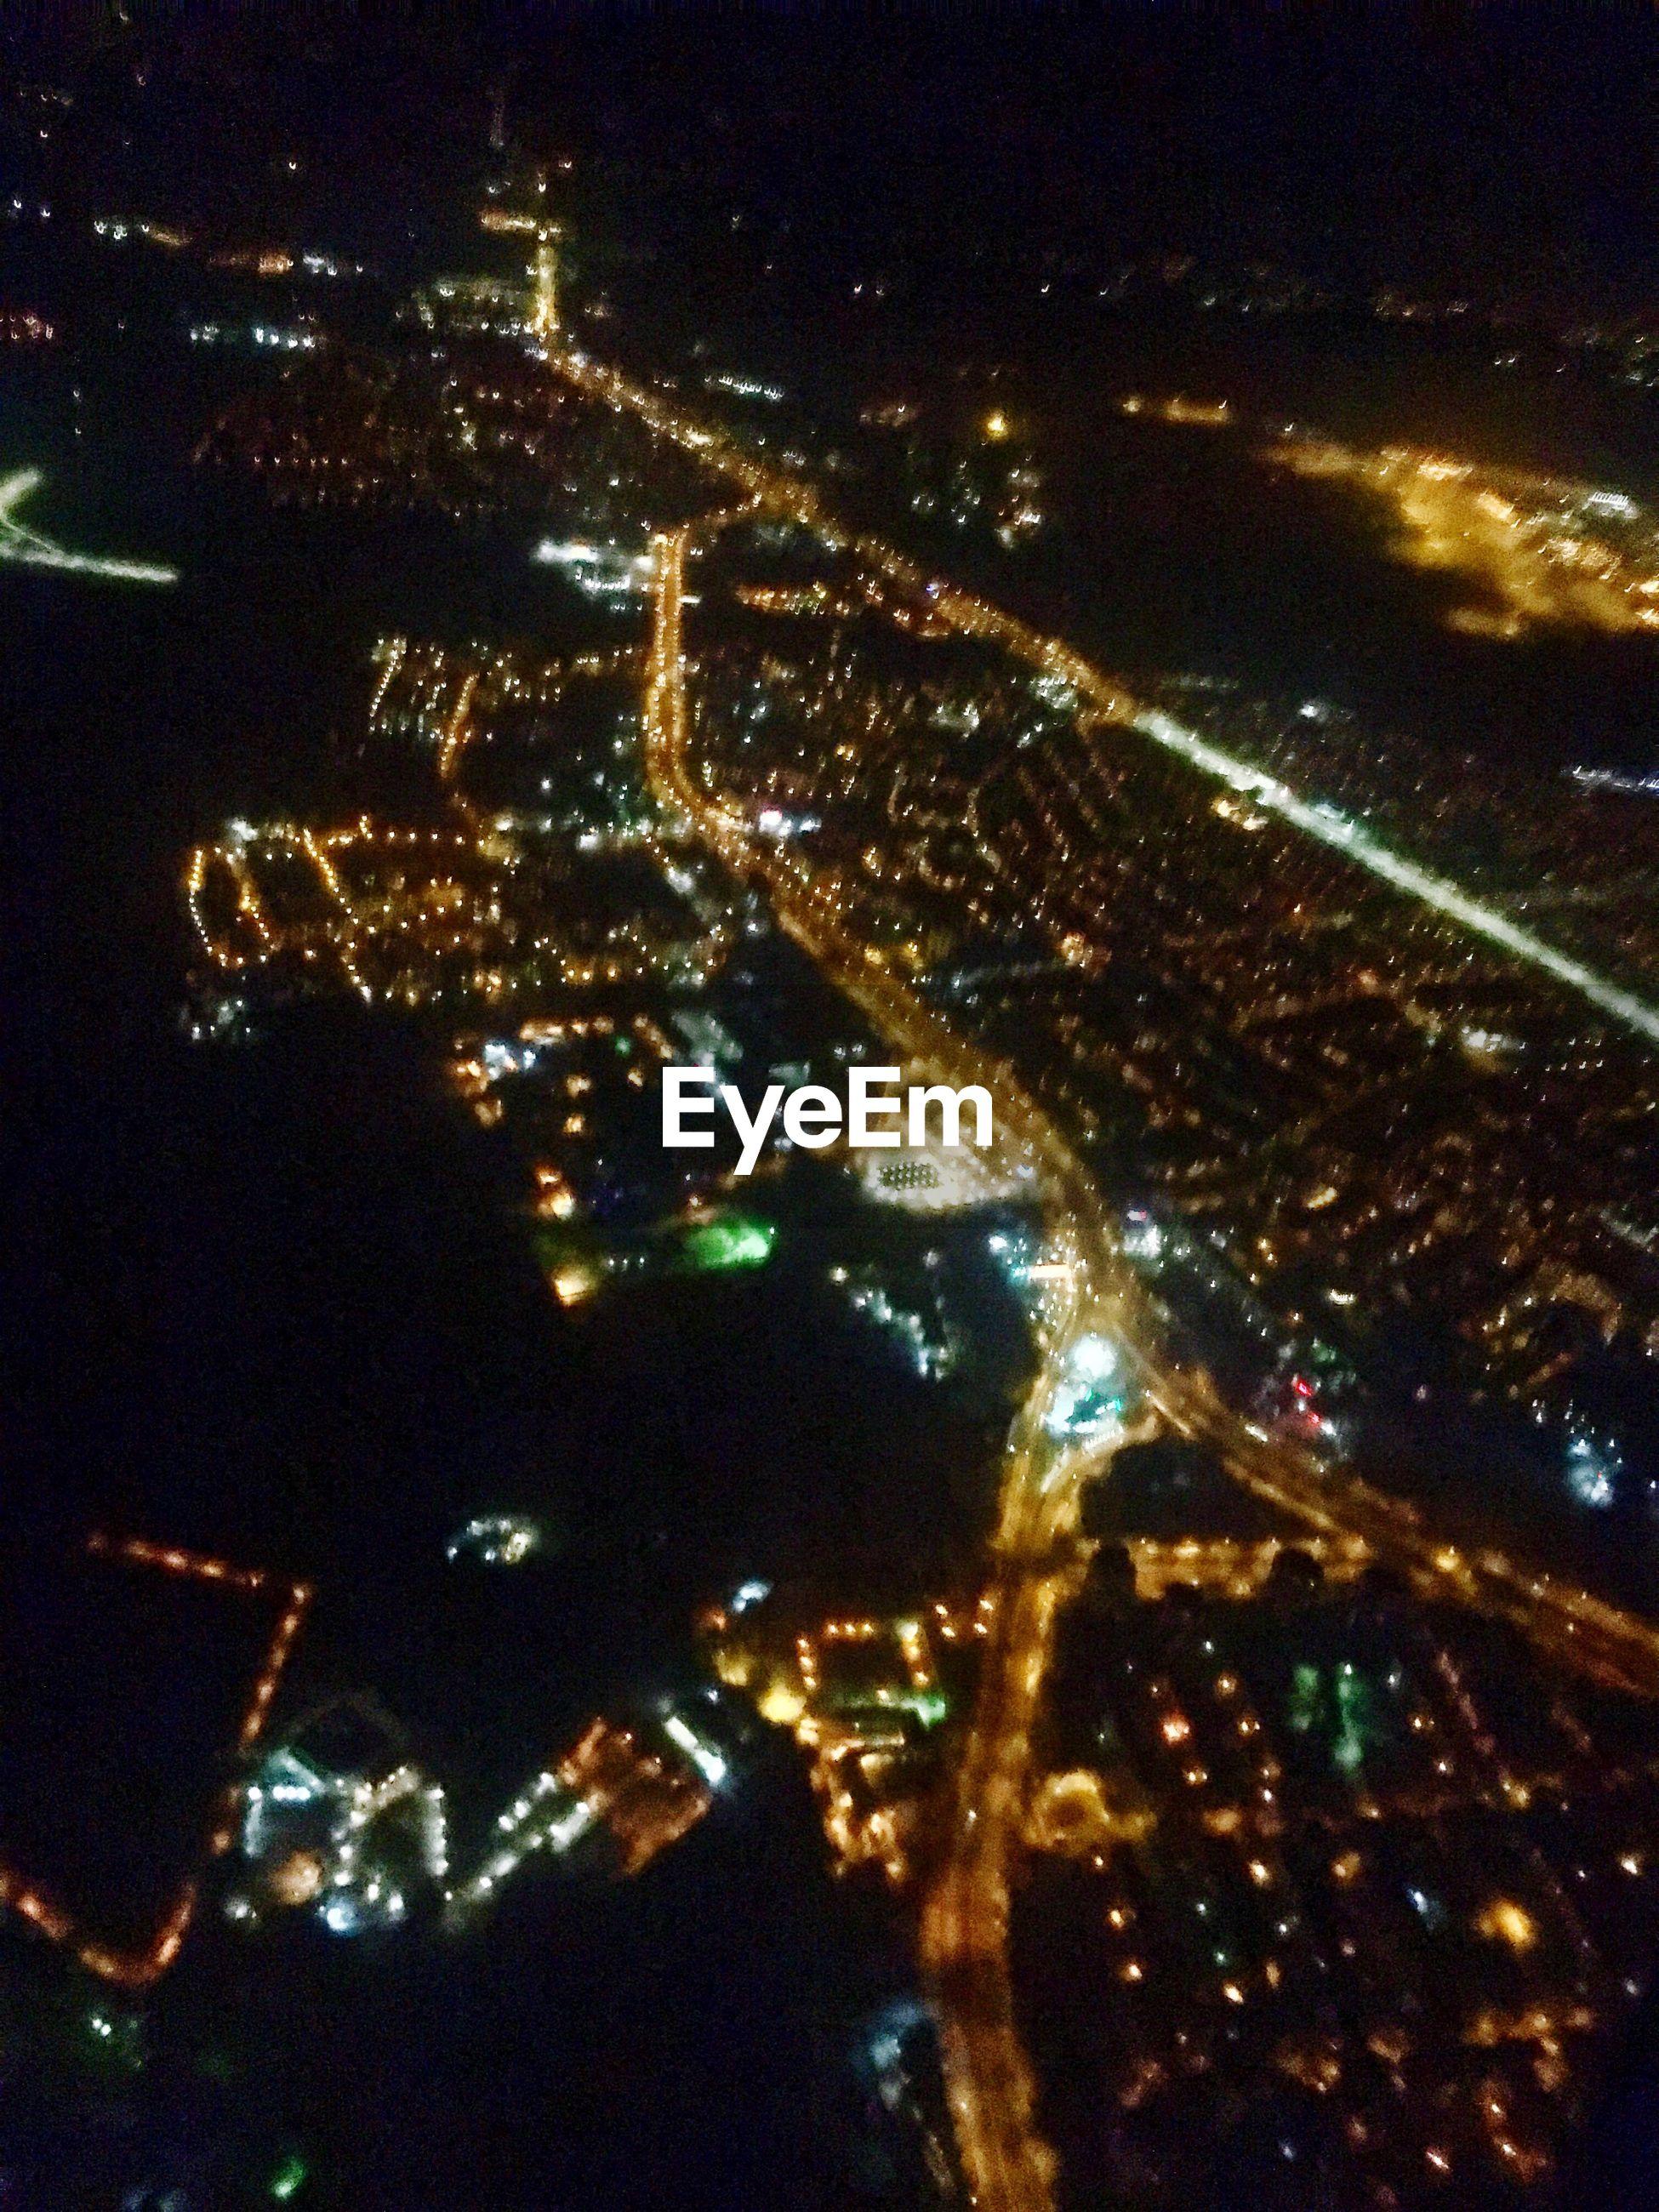 night, illuminated, celebration, arts culture and entertainment, lighting equipment, no people, outdoors, christmas lights, sky, nightlife, event